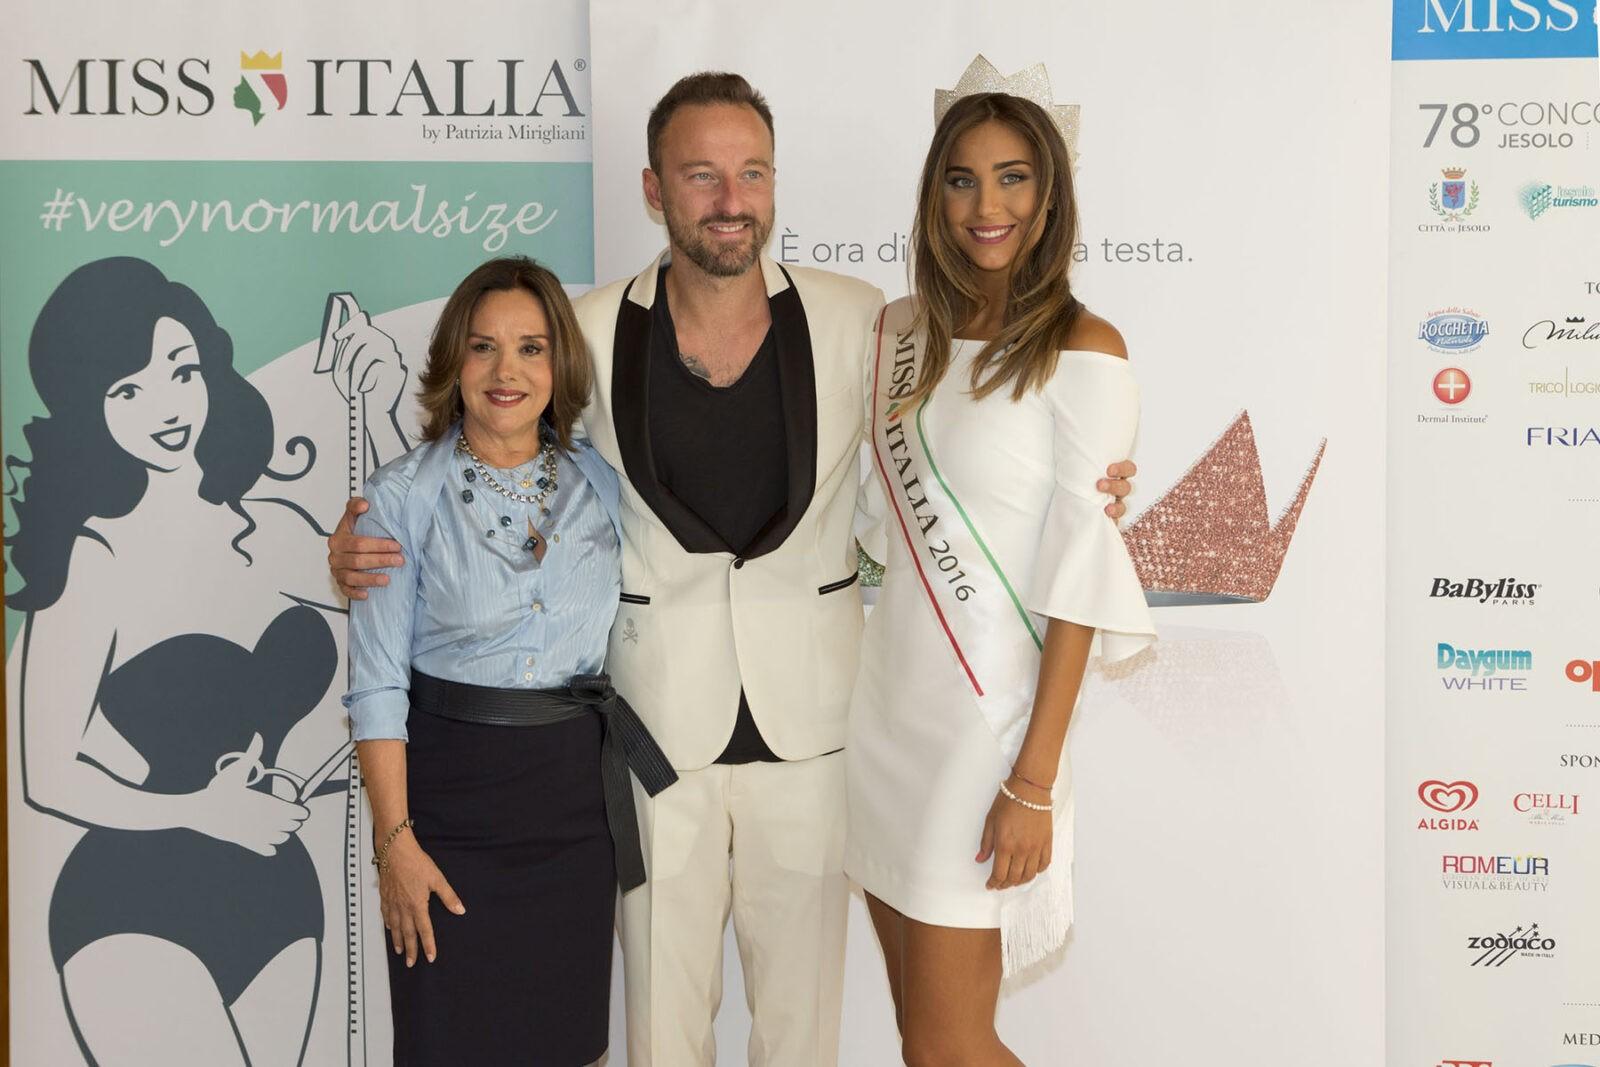 Miss Italia 2017: Federica Calemme, Miss Tricologica Campania 2017 (gallery)